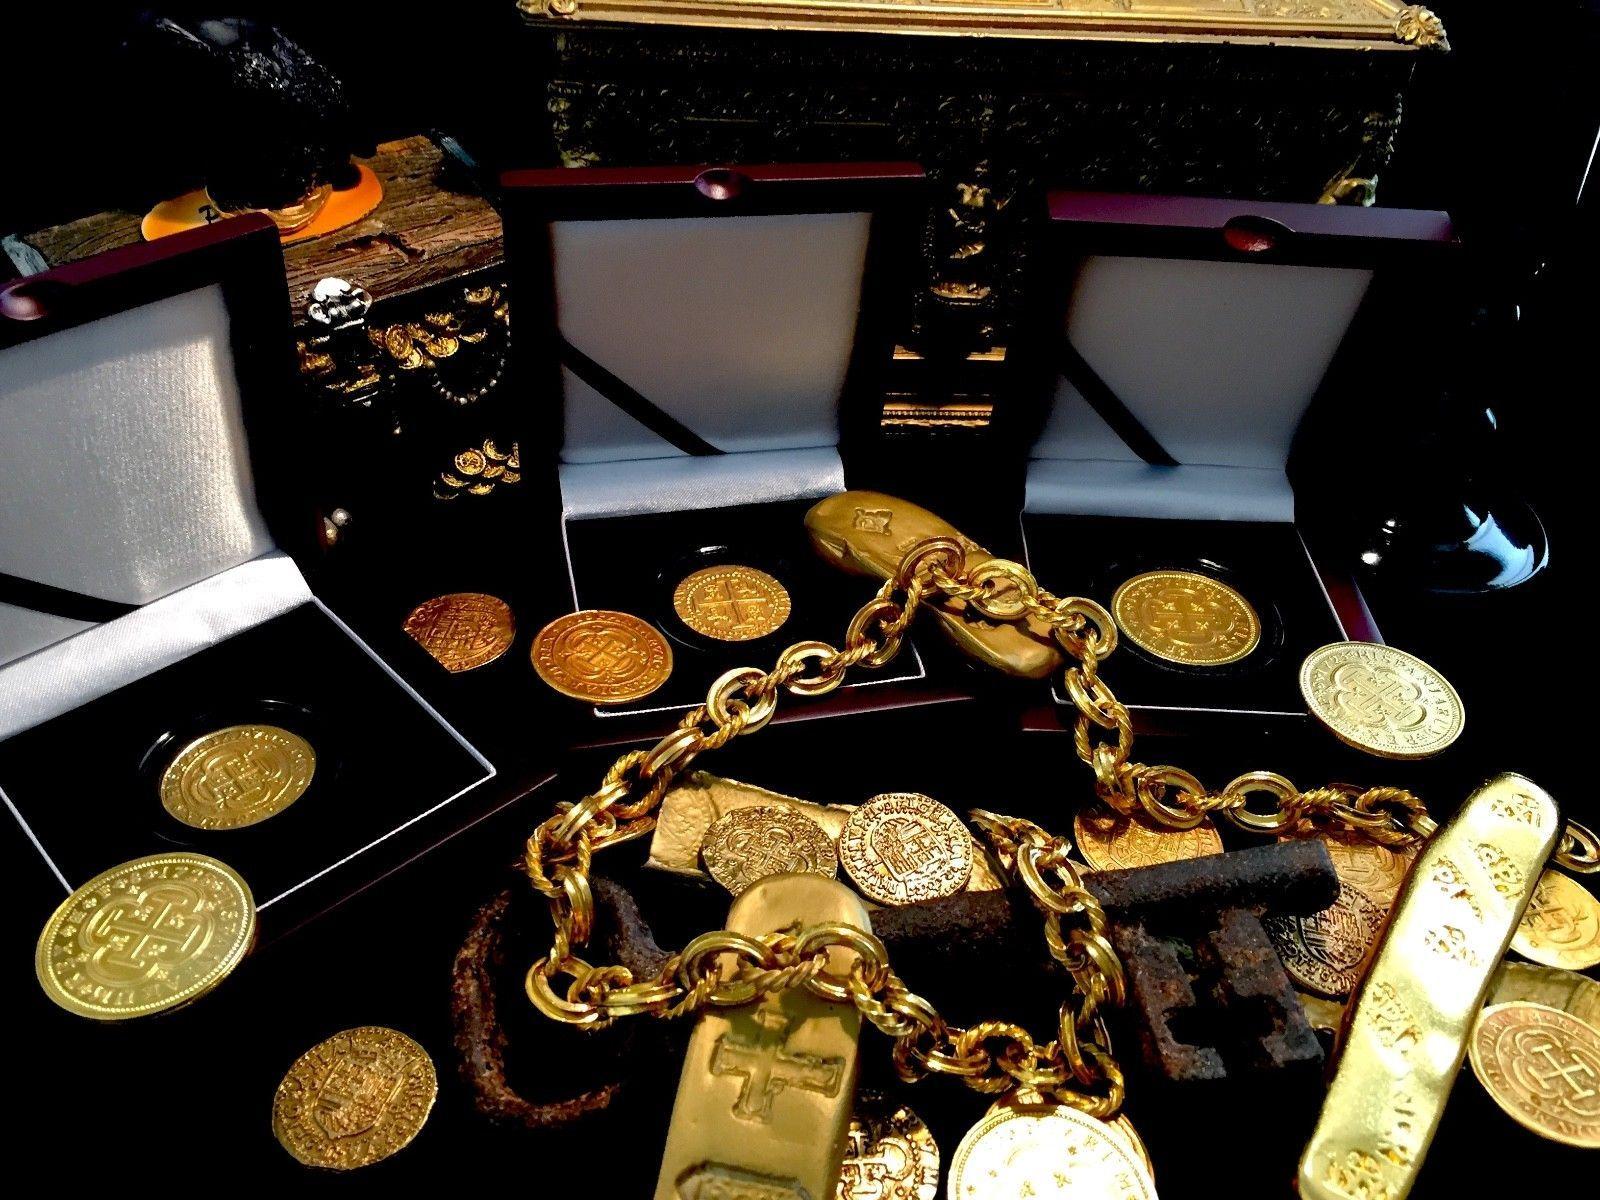 PERU LIMA 8 ESCUDOS 1710 24kt. PLATED GOLD DOUBLOON 1715 FLEET TREASURE COIN